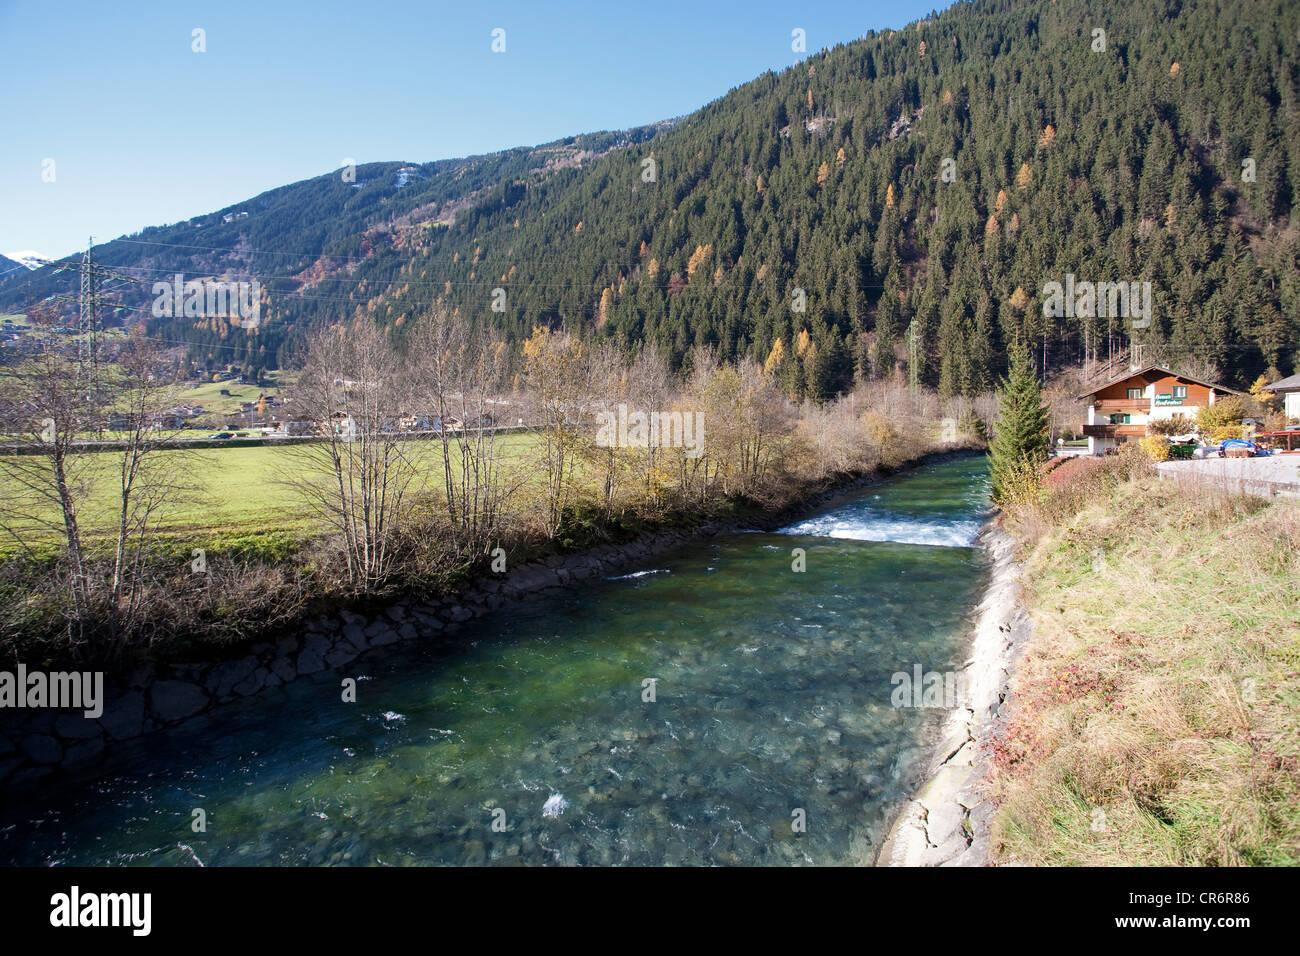 Ziller River, Mayrhofen, popular resort town in the Zillertal valley, Schwaz district, Zillertal valley, Tyrol, - Stock Image